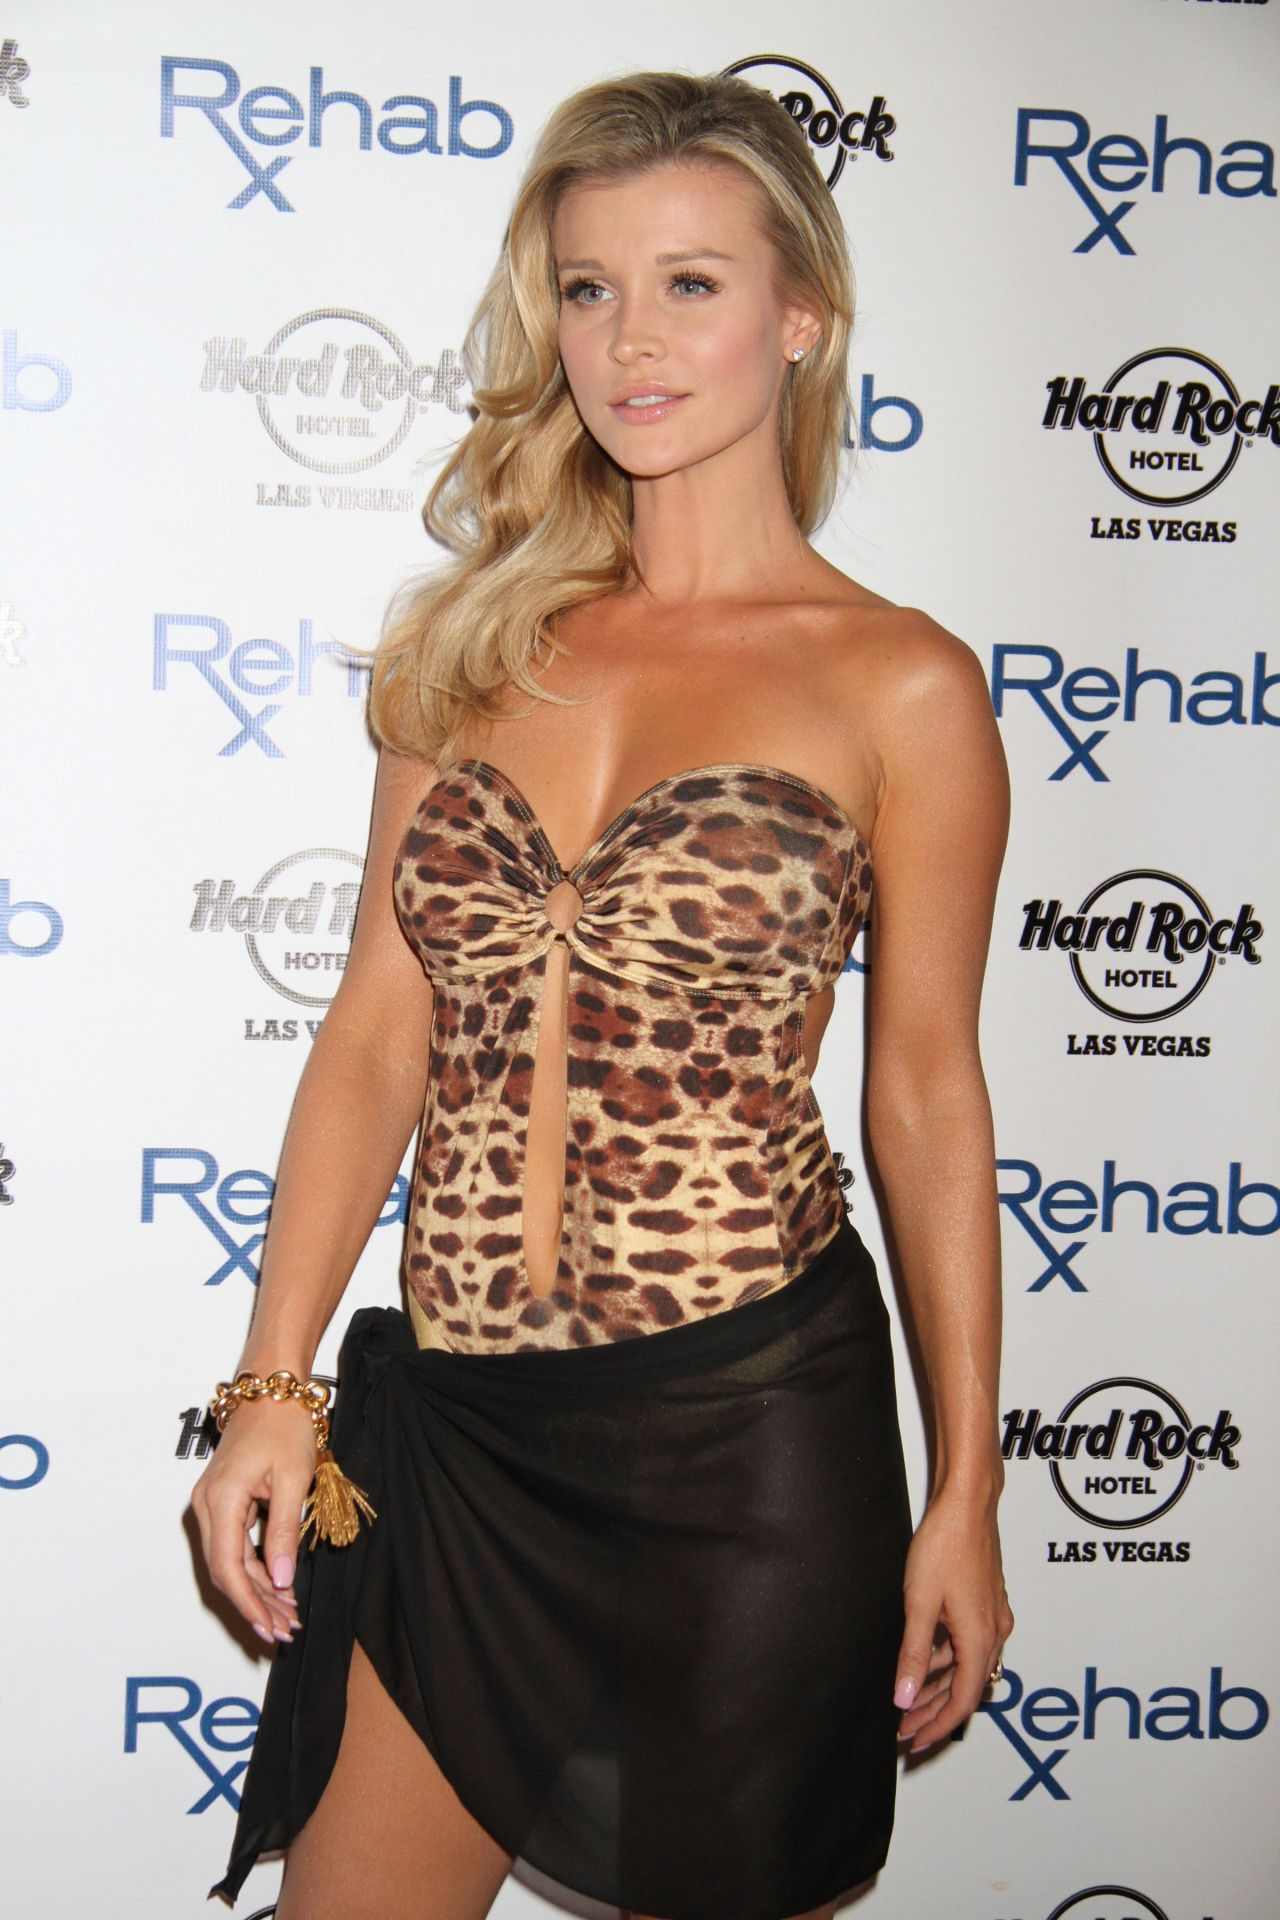 Joanna Krupa Amp Marta Krupa Host Rehab Bikini